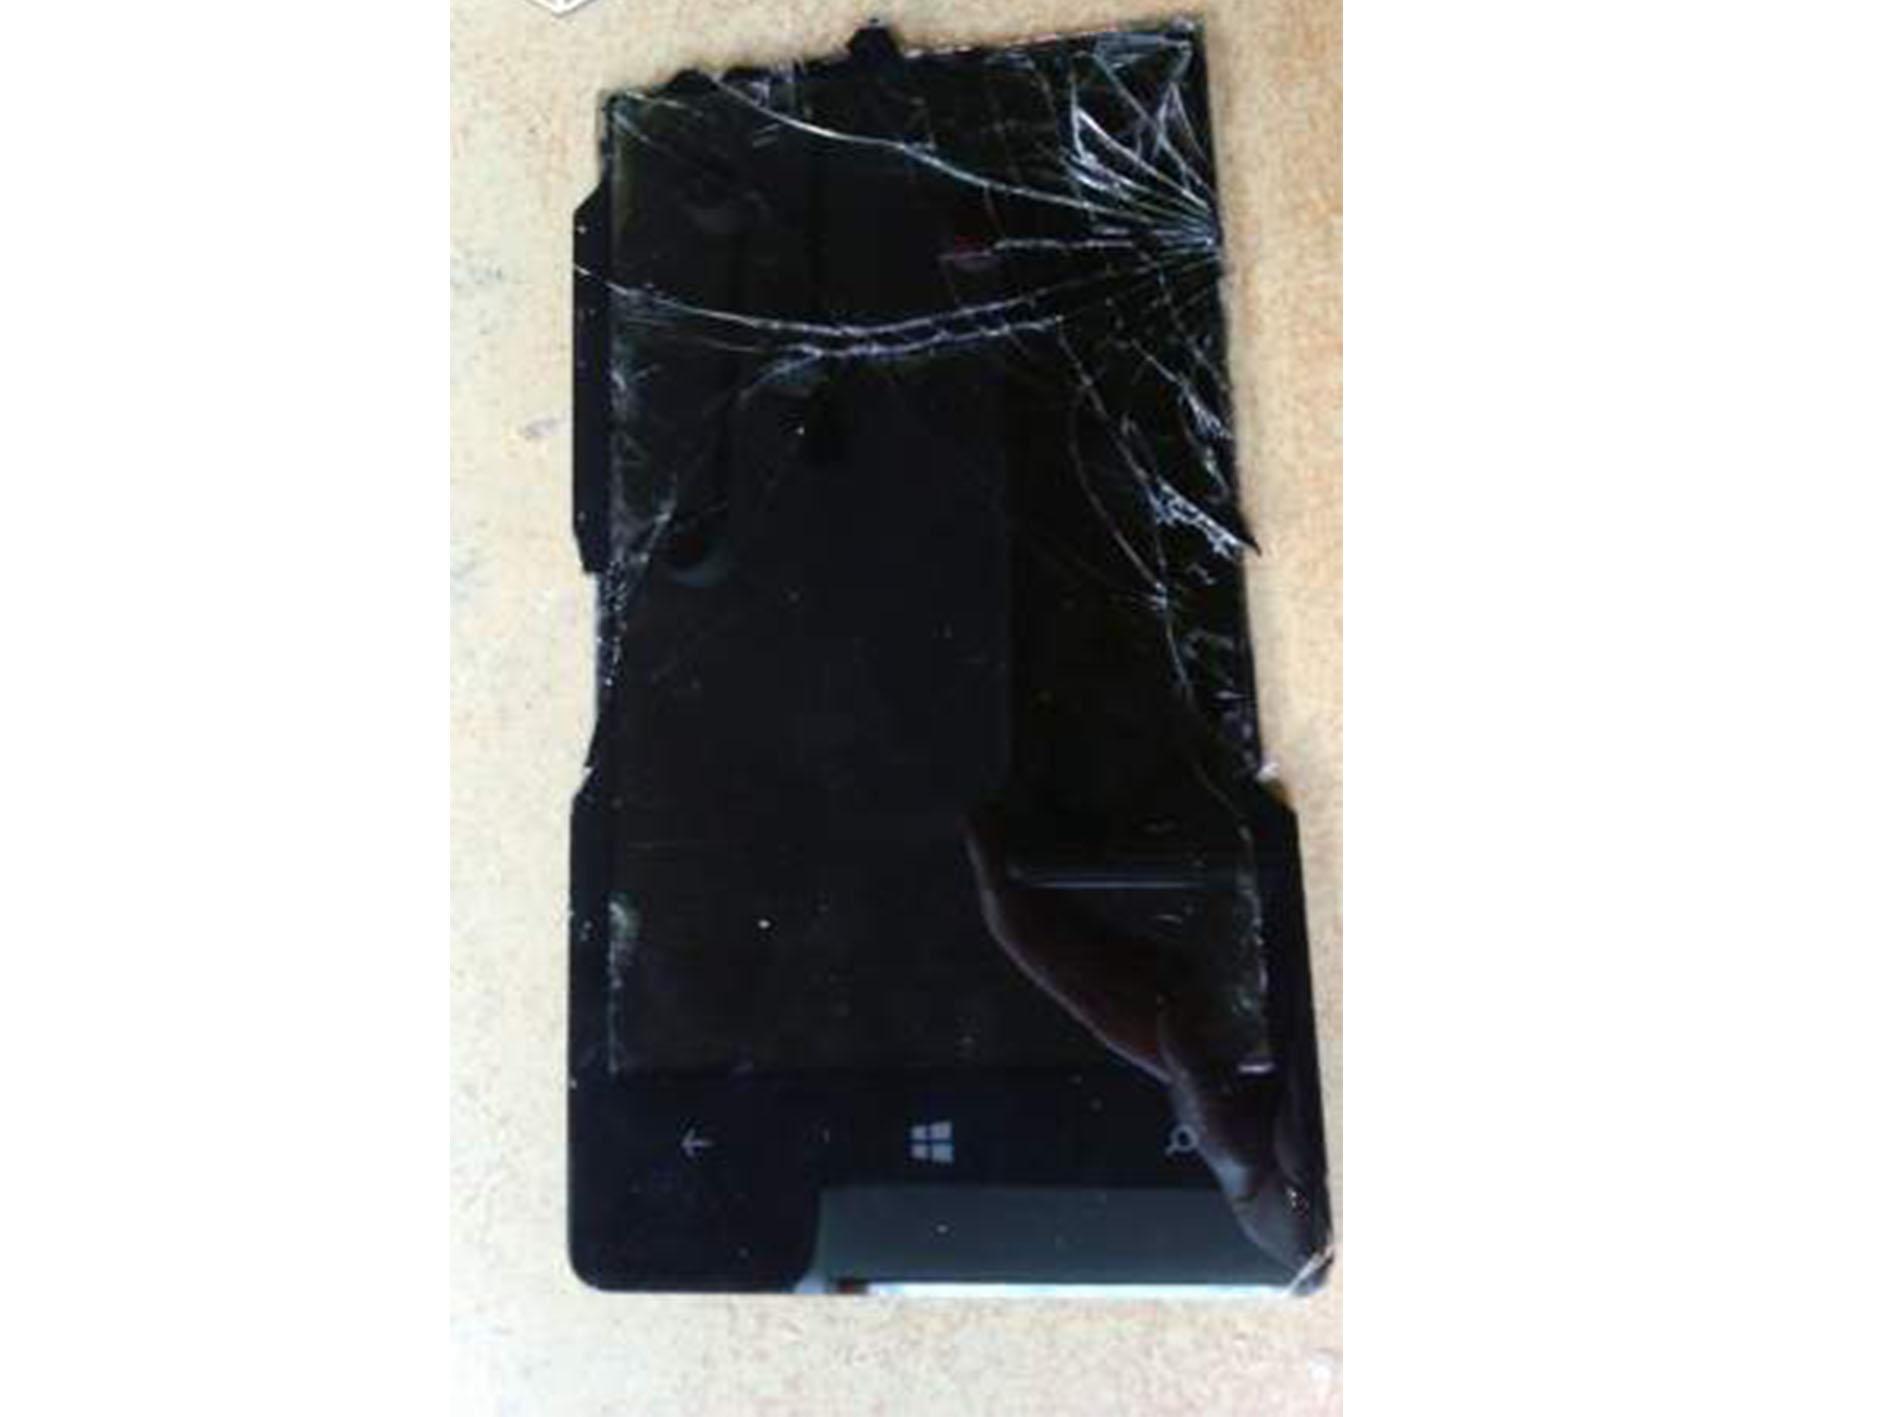 Vente NOKIA LUMIA 1020 4G avec écran cassé